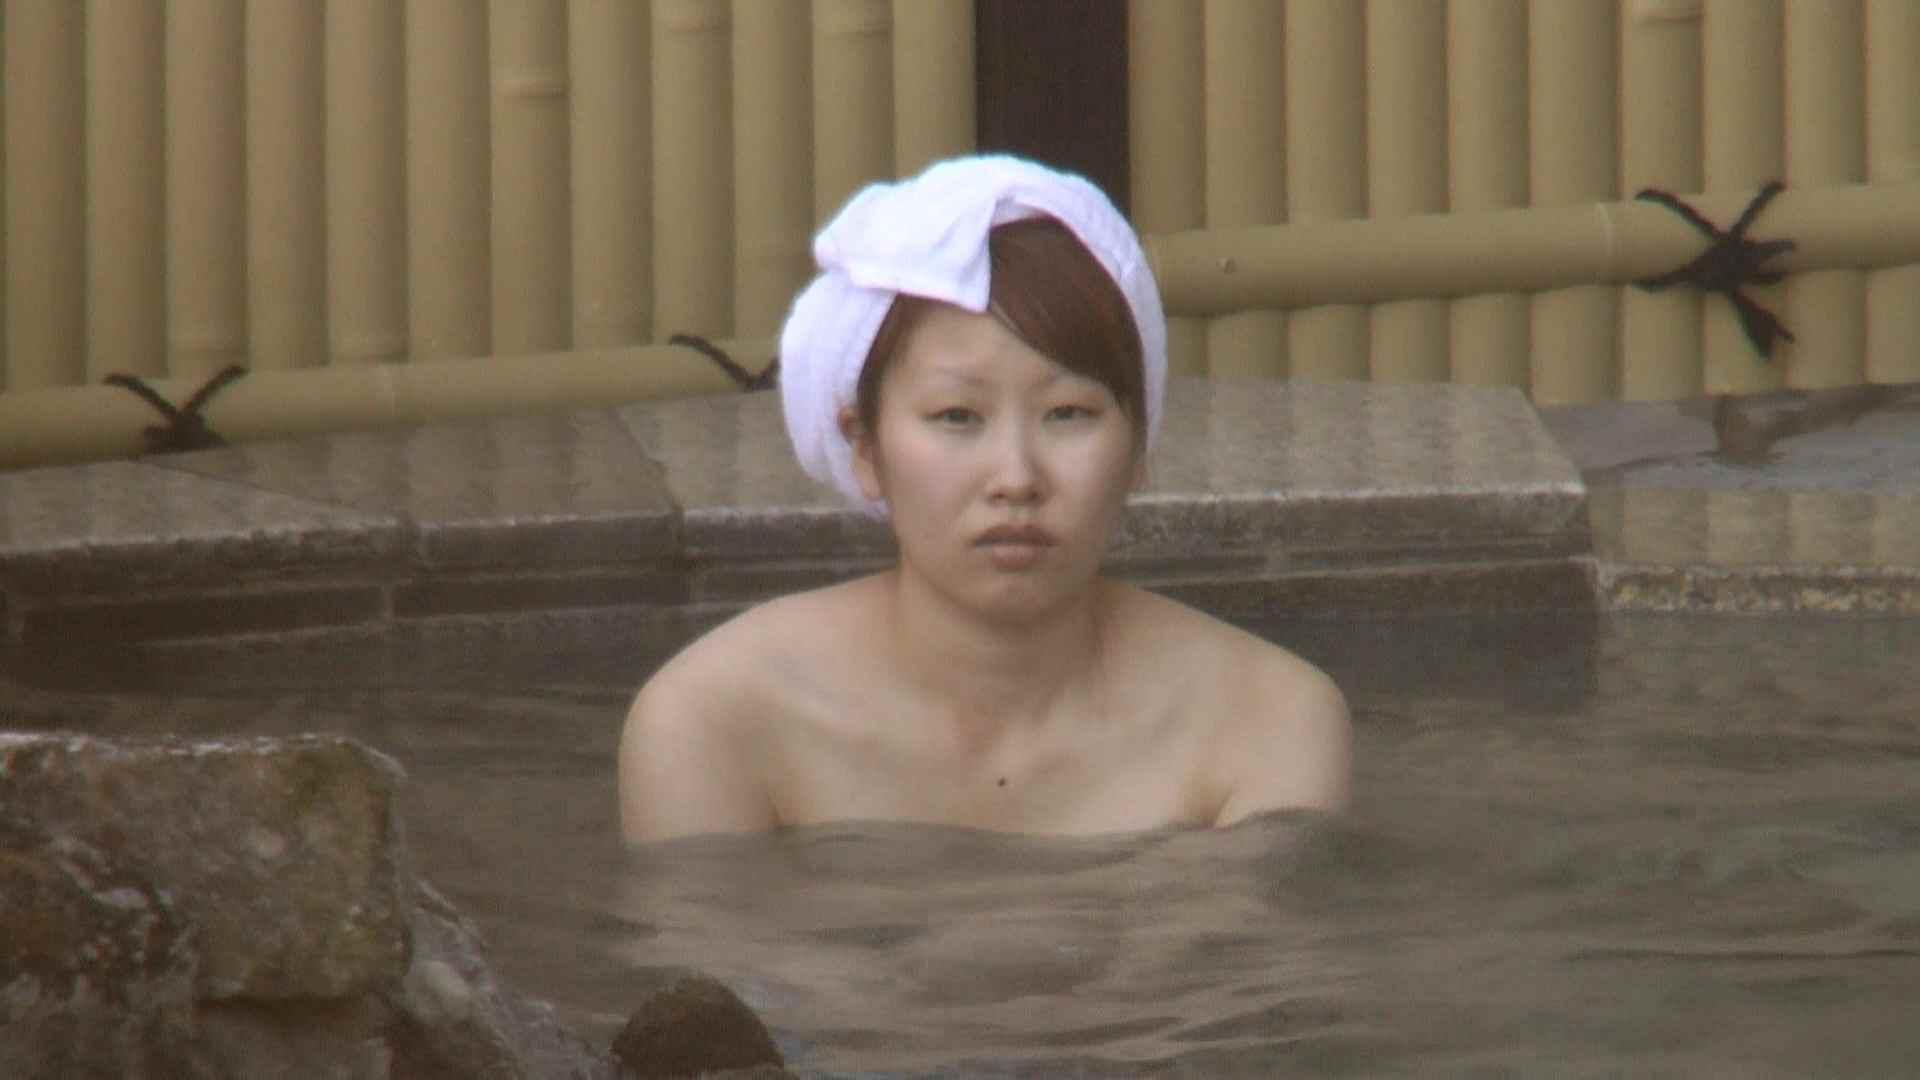 Aquaな露天風呂Vol.210 露天風呂編  86PIX 24